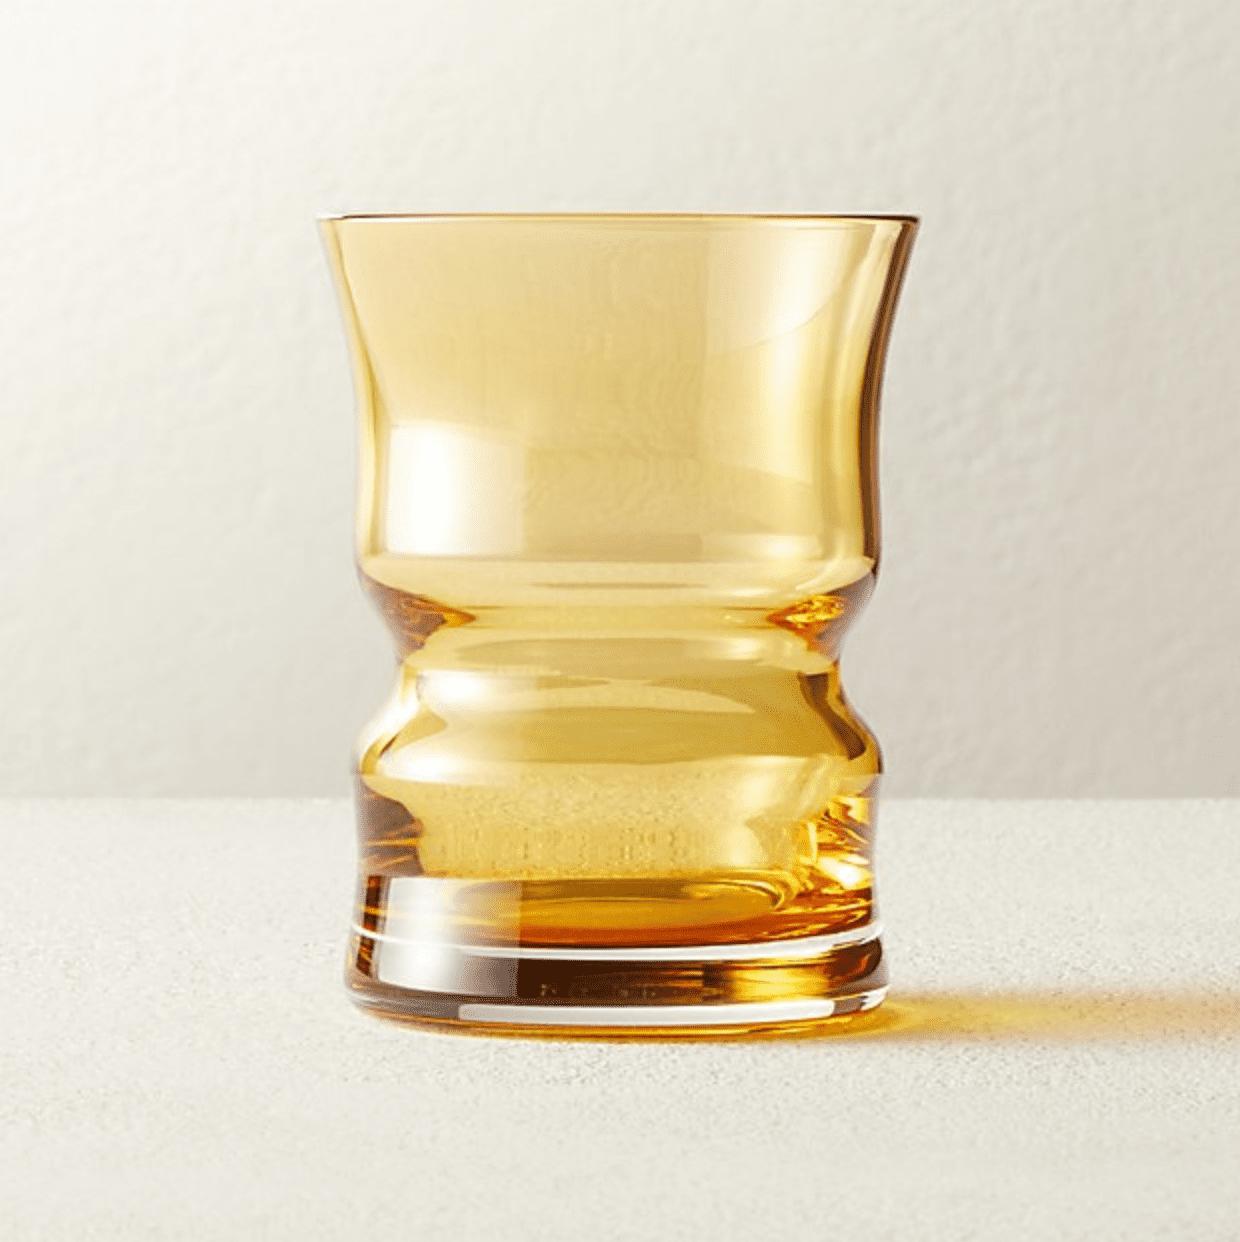 vidrio de color ámbar